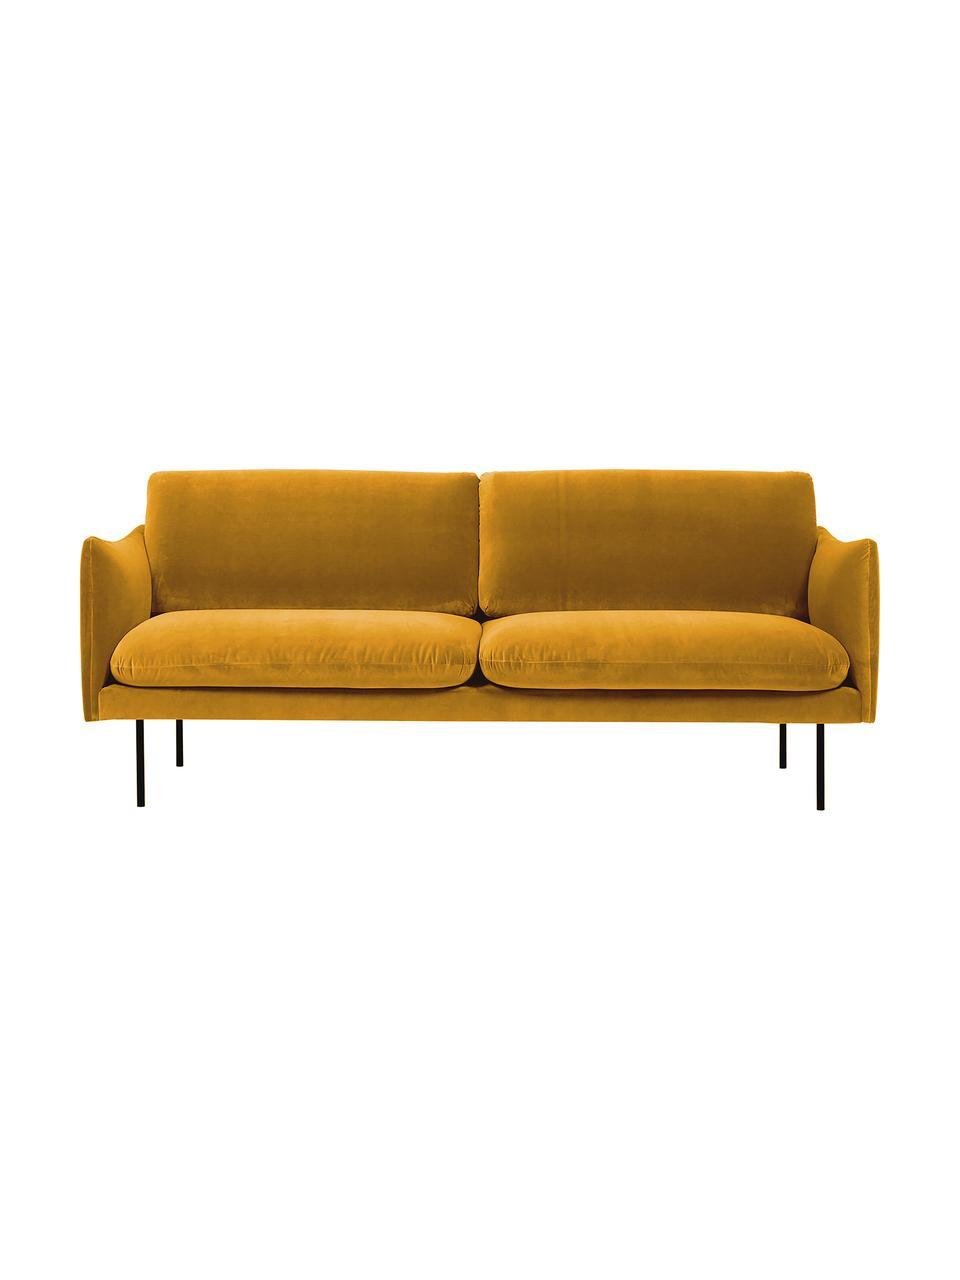 Canapé 2places velours jaune moutarde Moby, Velours jaune moutarde